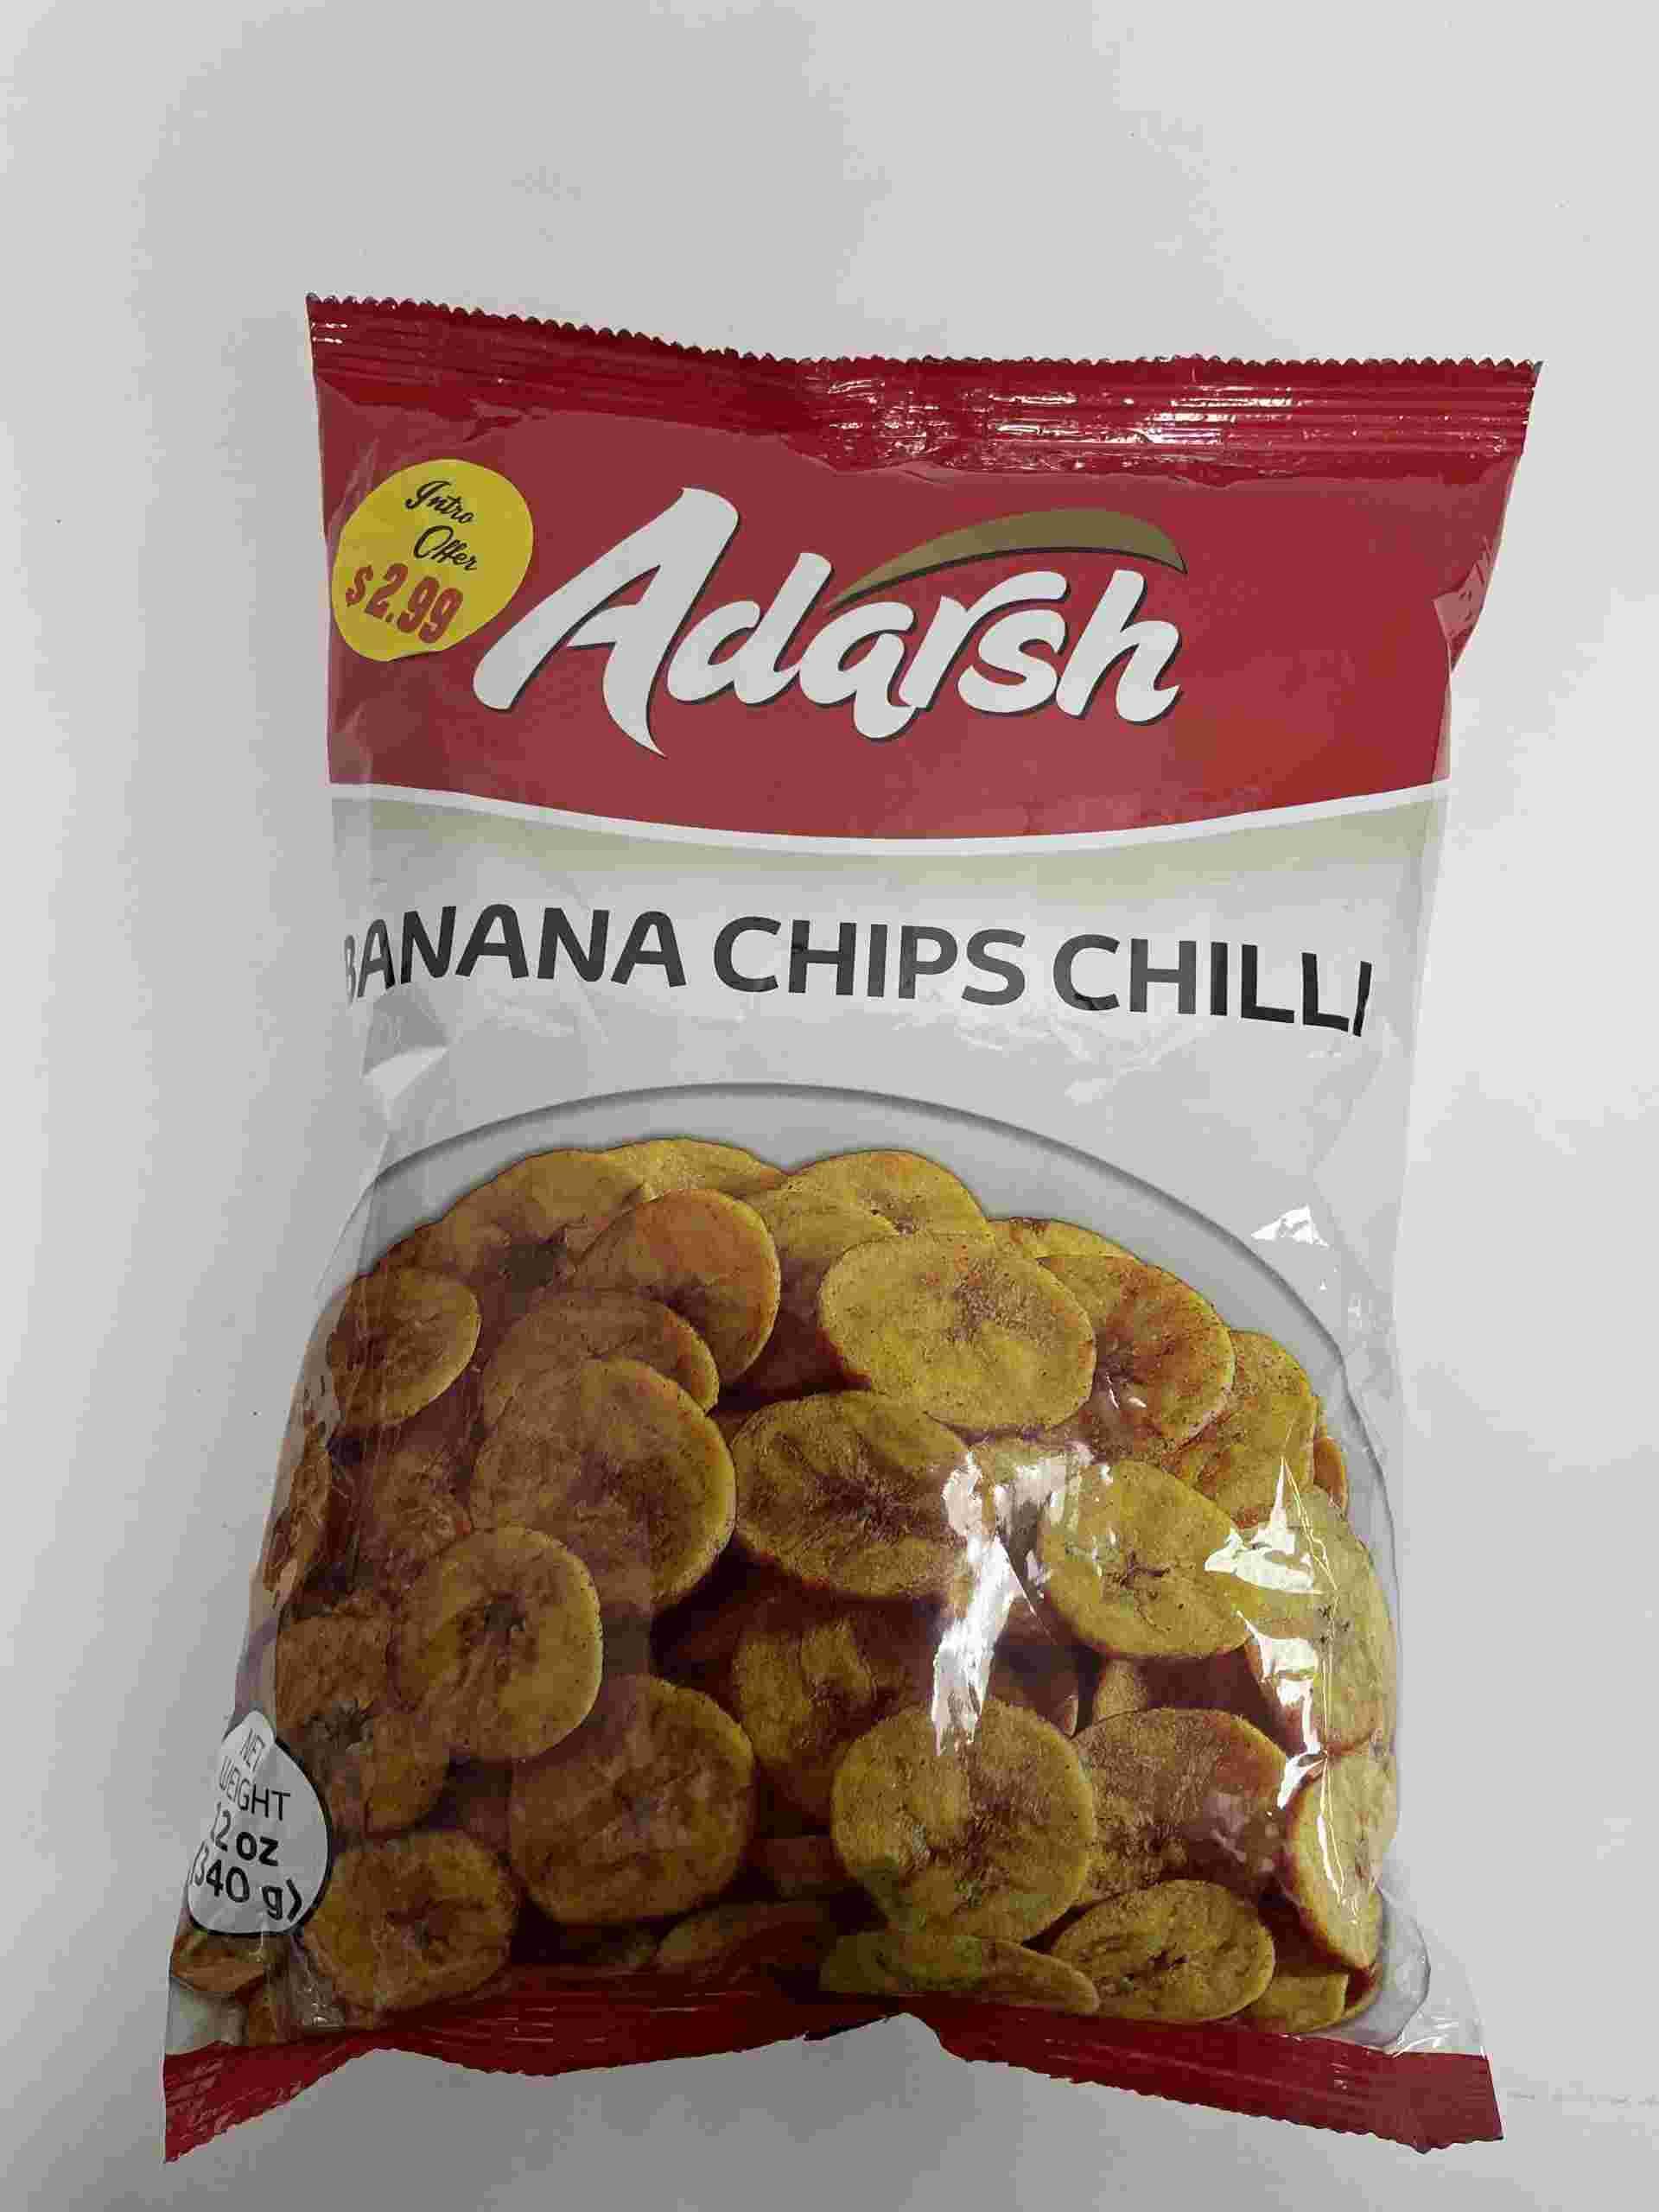 Adarsh Banana Chips Chilli